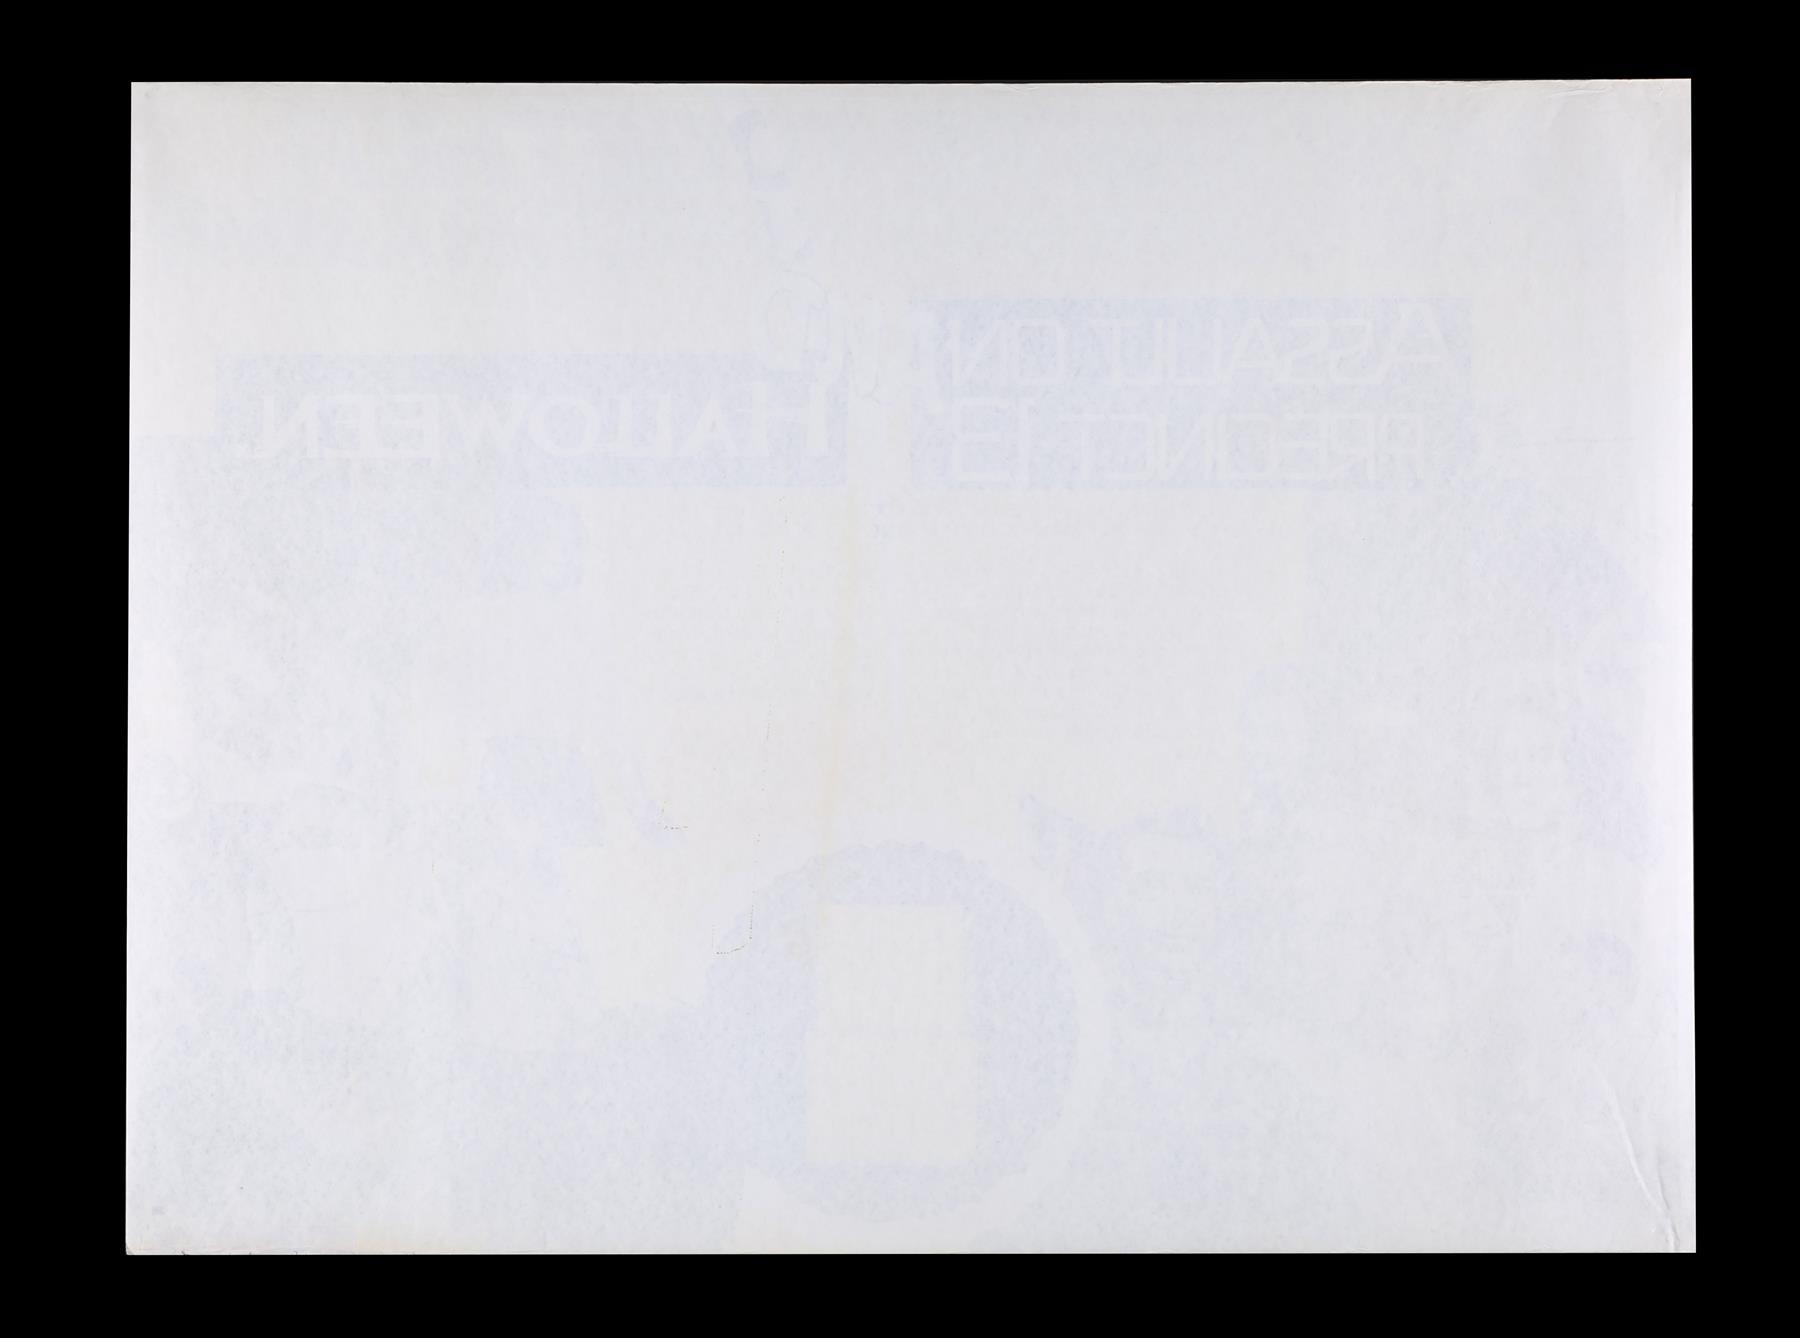 ASSAULT ON PRECINCT 13 (1976), HALLOWEEN (1979) - Two UK Quads, 1979 - Image 3 of 5